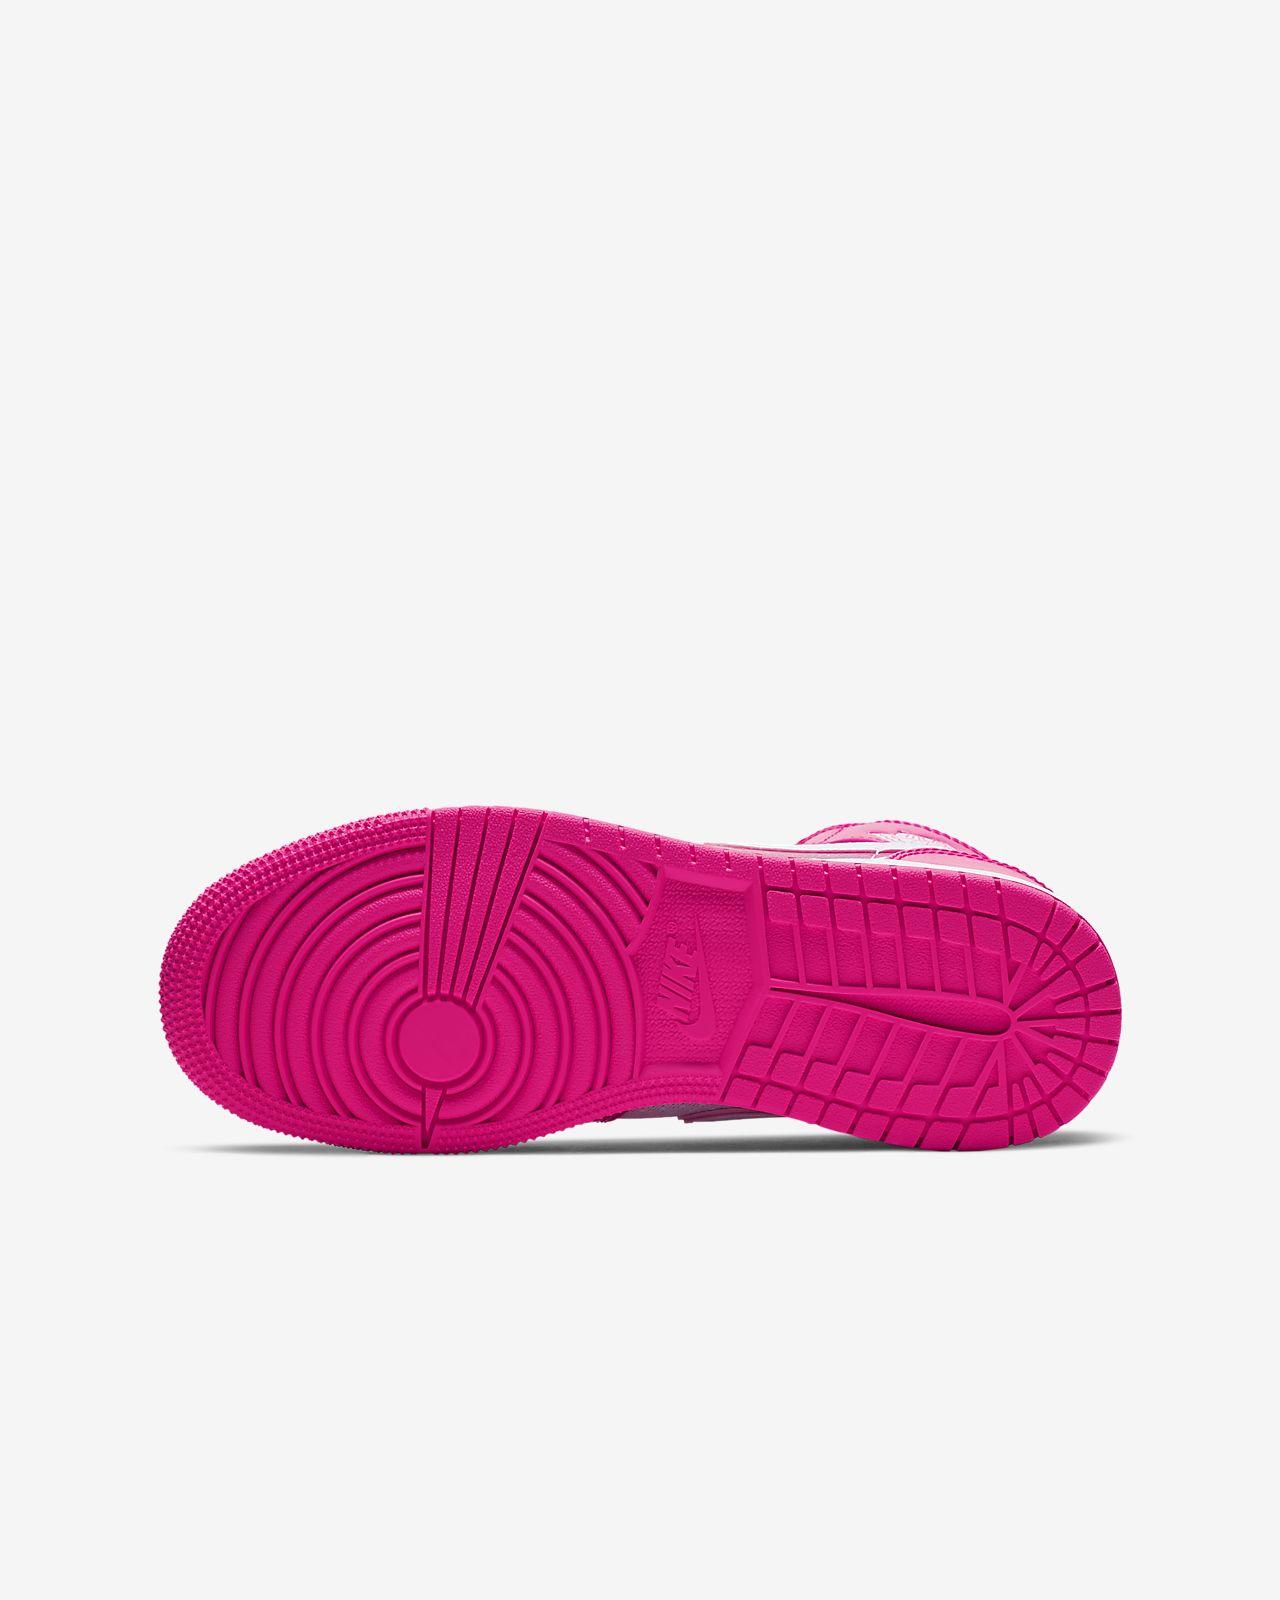 64dd803601ff Air Jordan 1 Mid Big Kids  Shoe. Nike.com